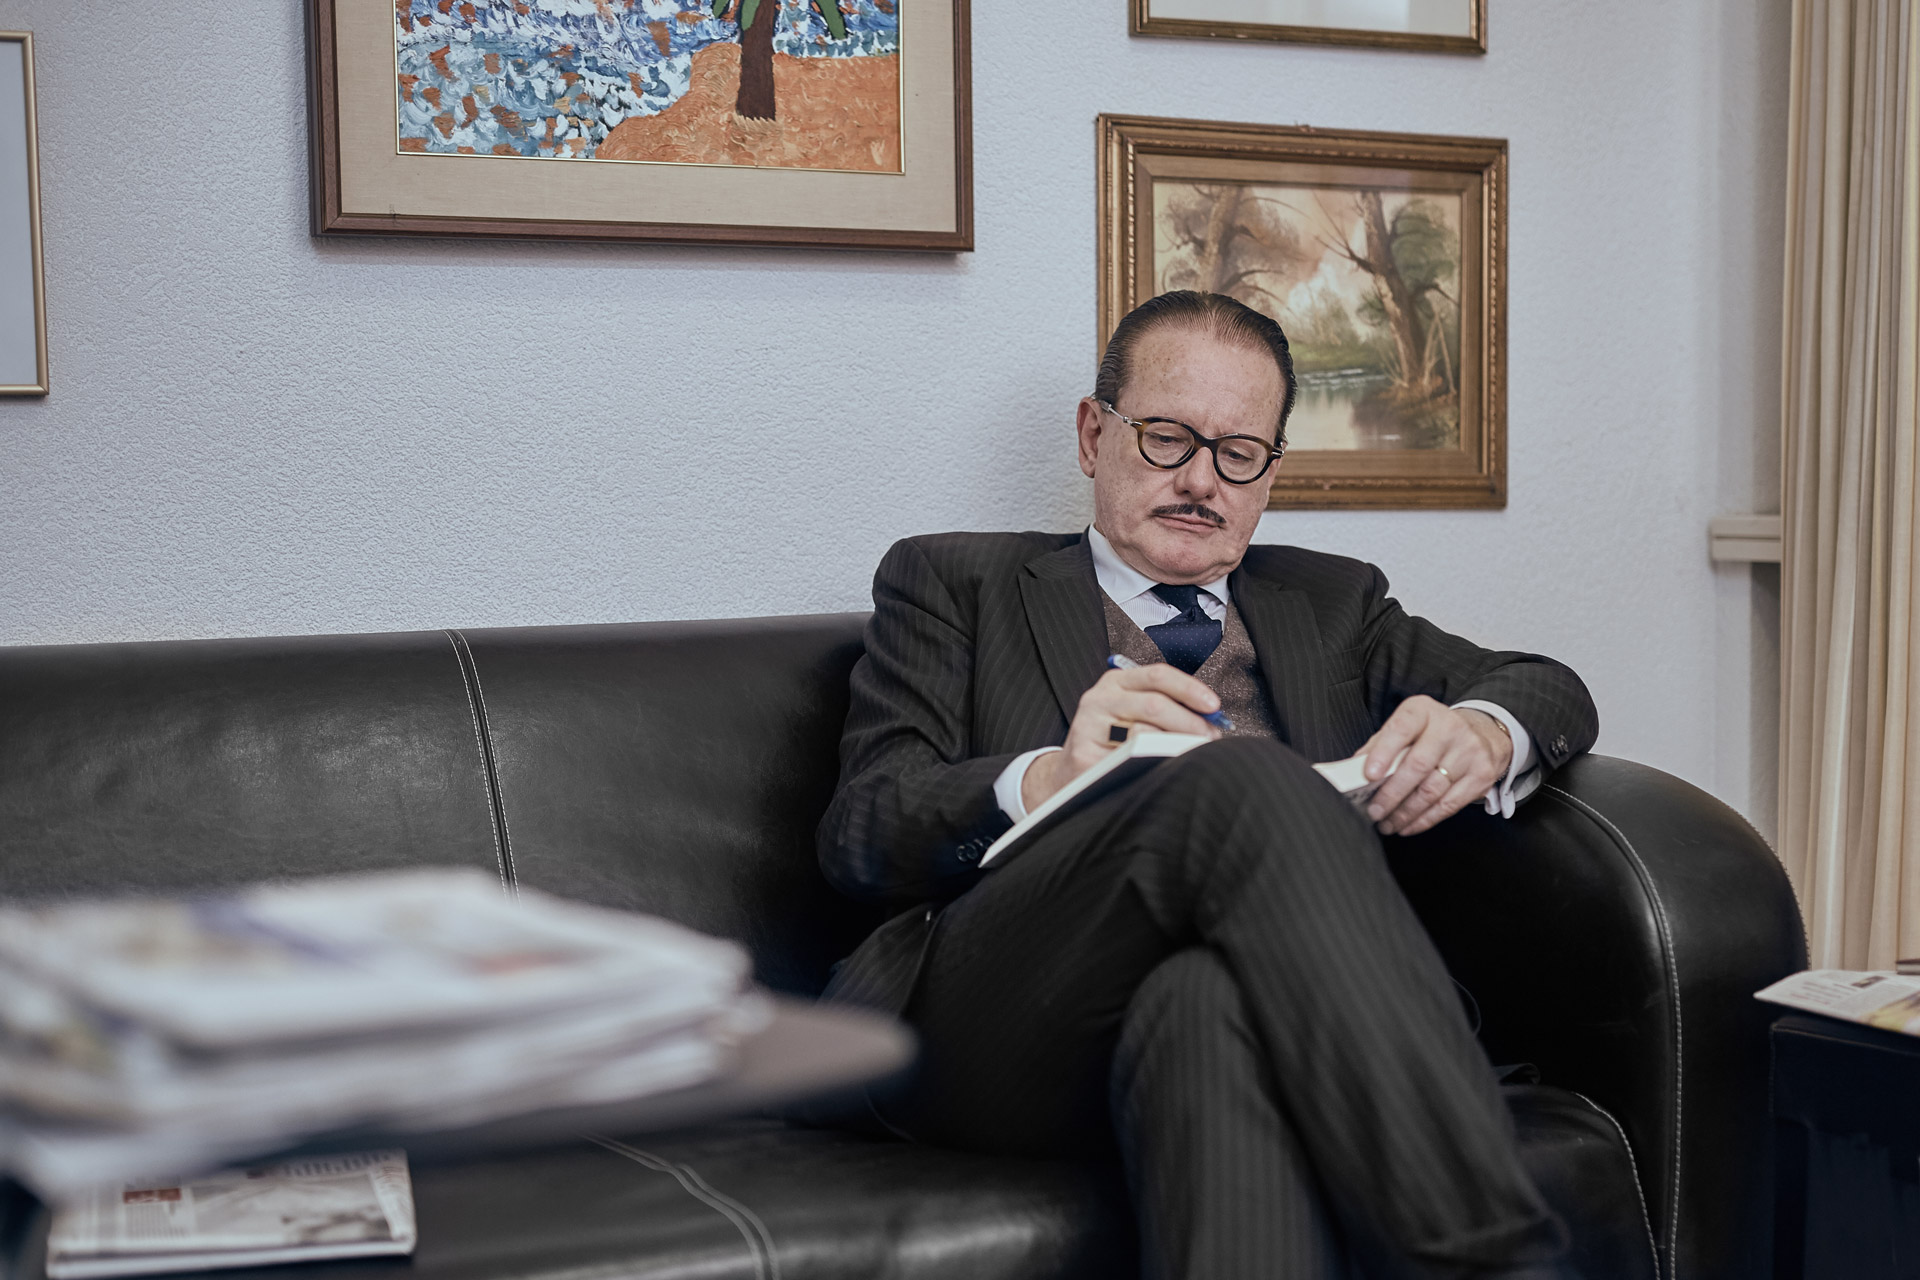 Intervista al Dr. med. Orlando Del Don Medico, docente, ricercatore, politico